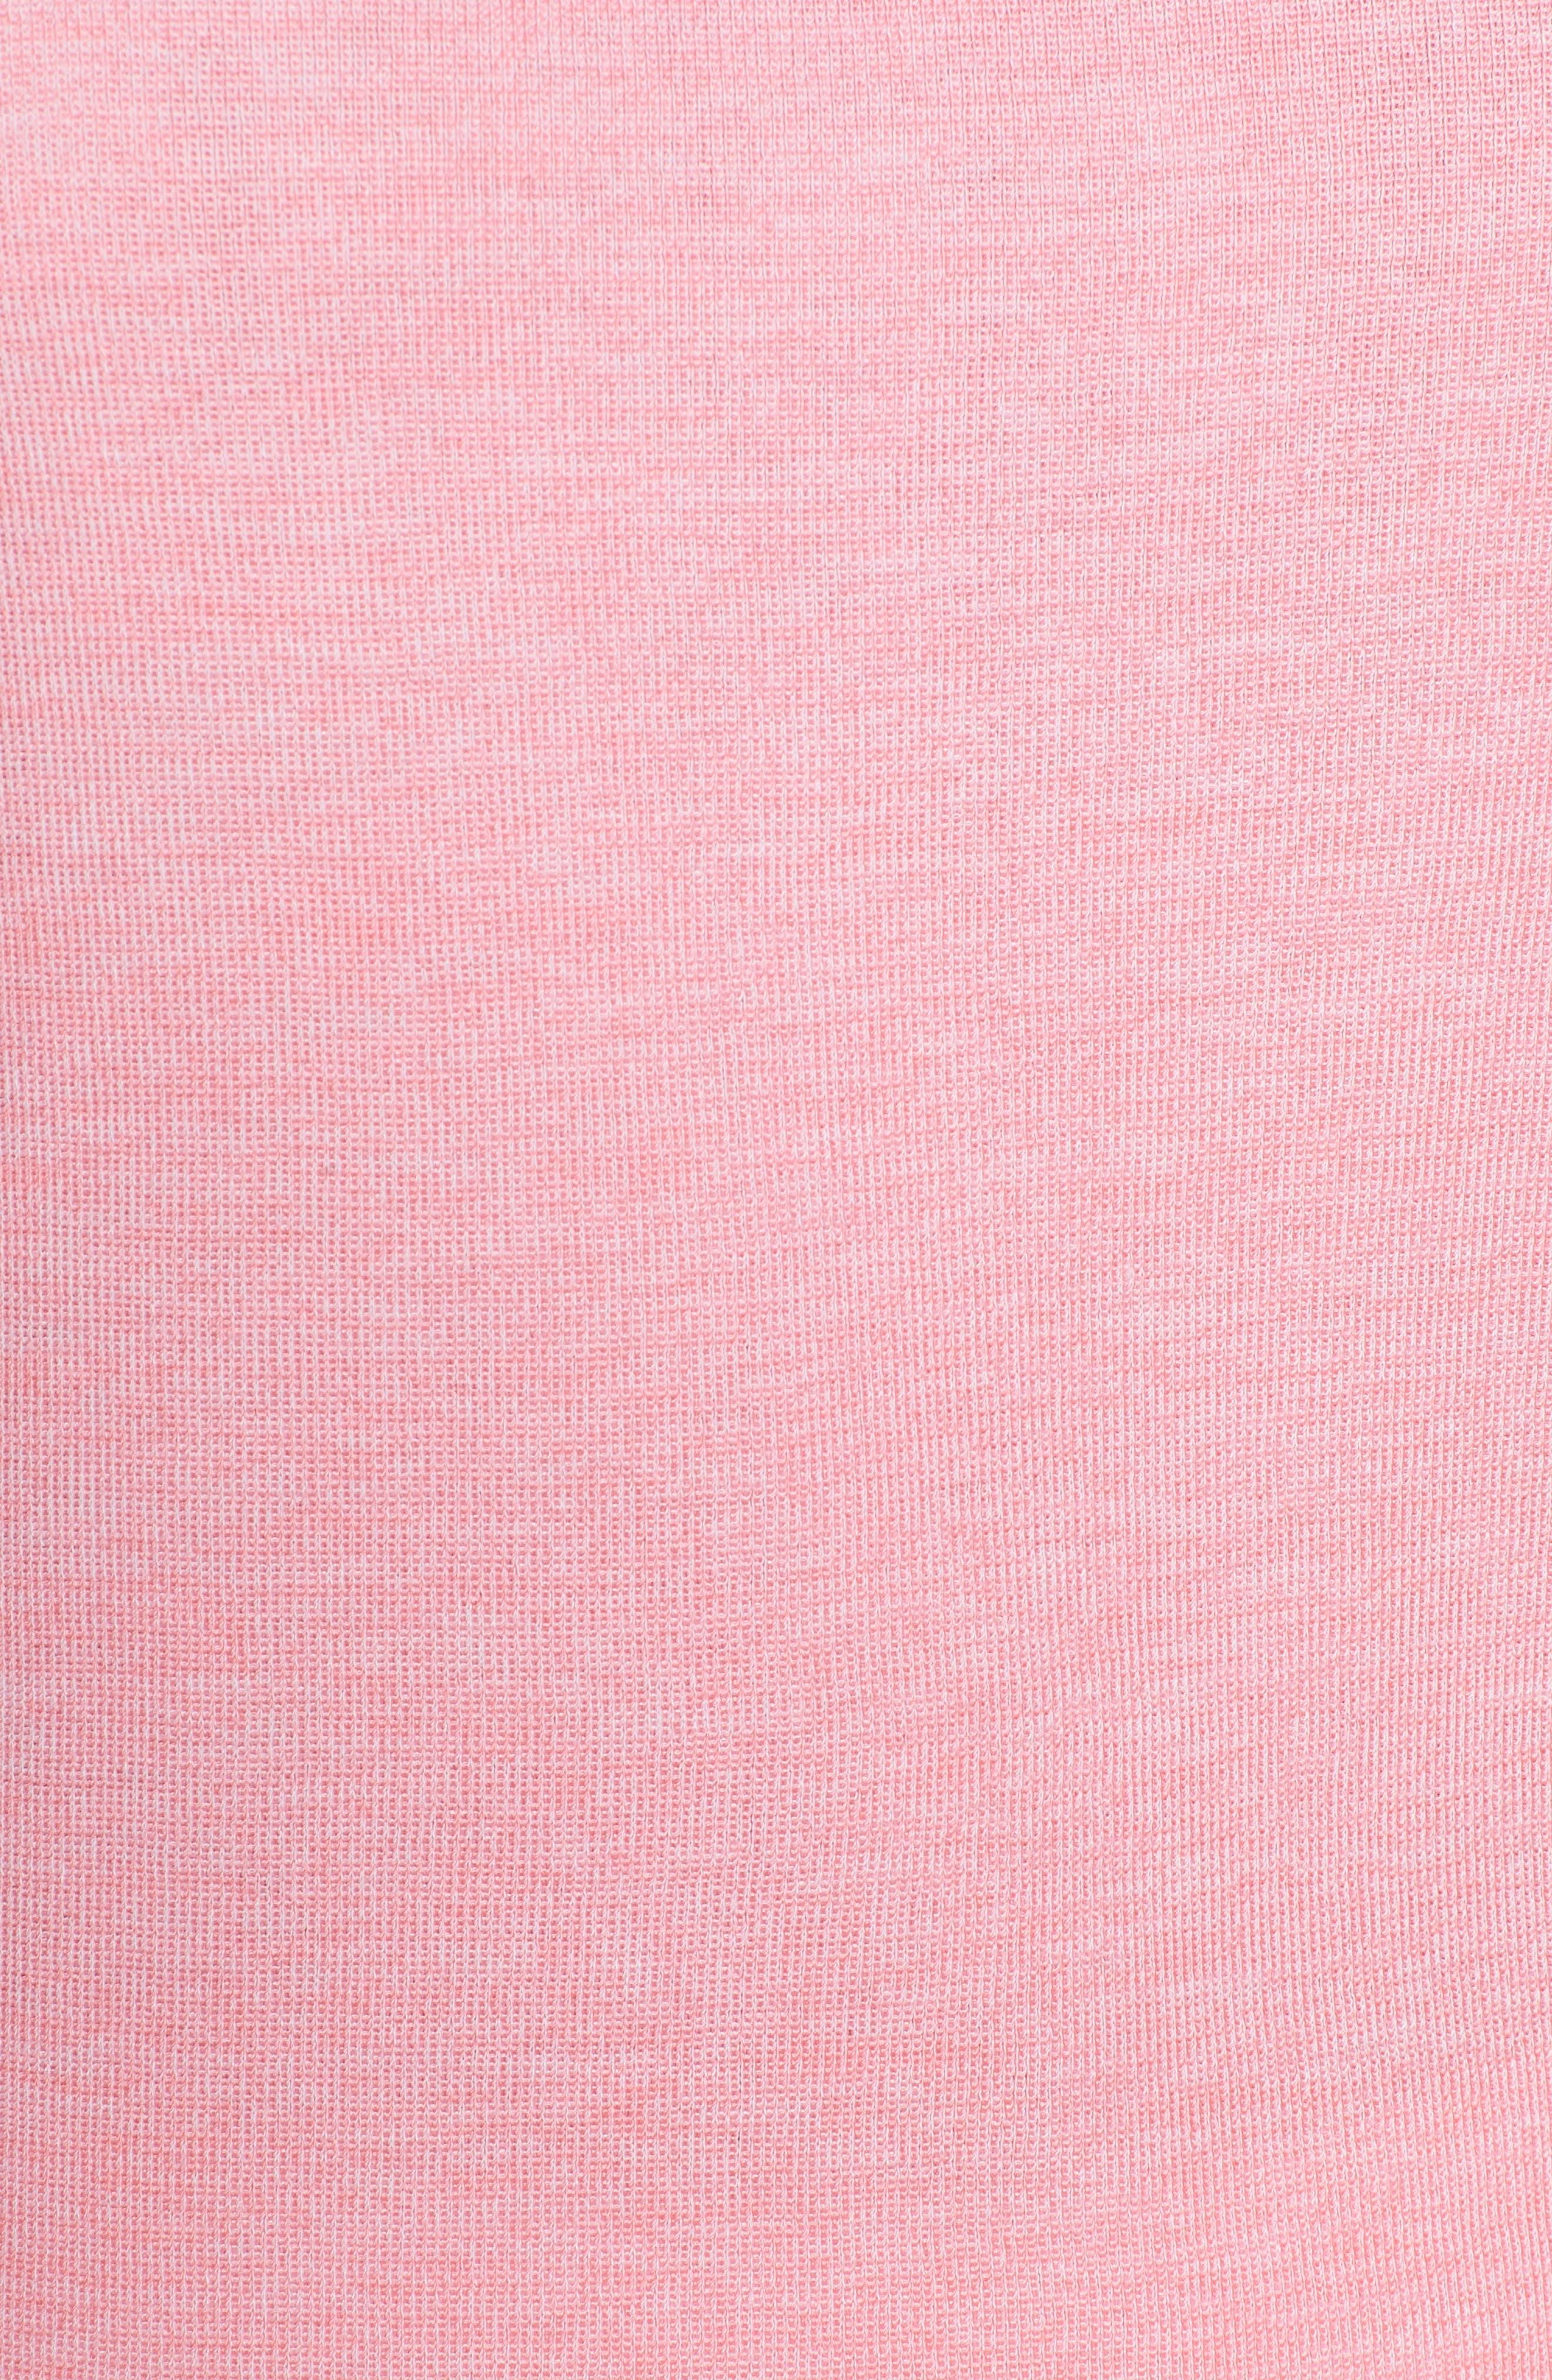 Sweetheart Tank,                             Alternate thumbnail 5, color,                             Pink Lemonade/ White